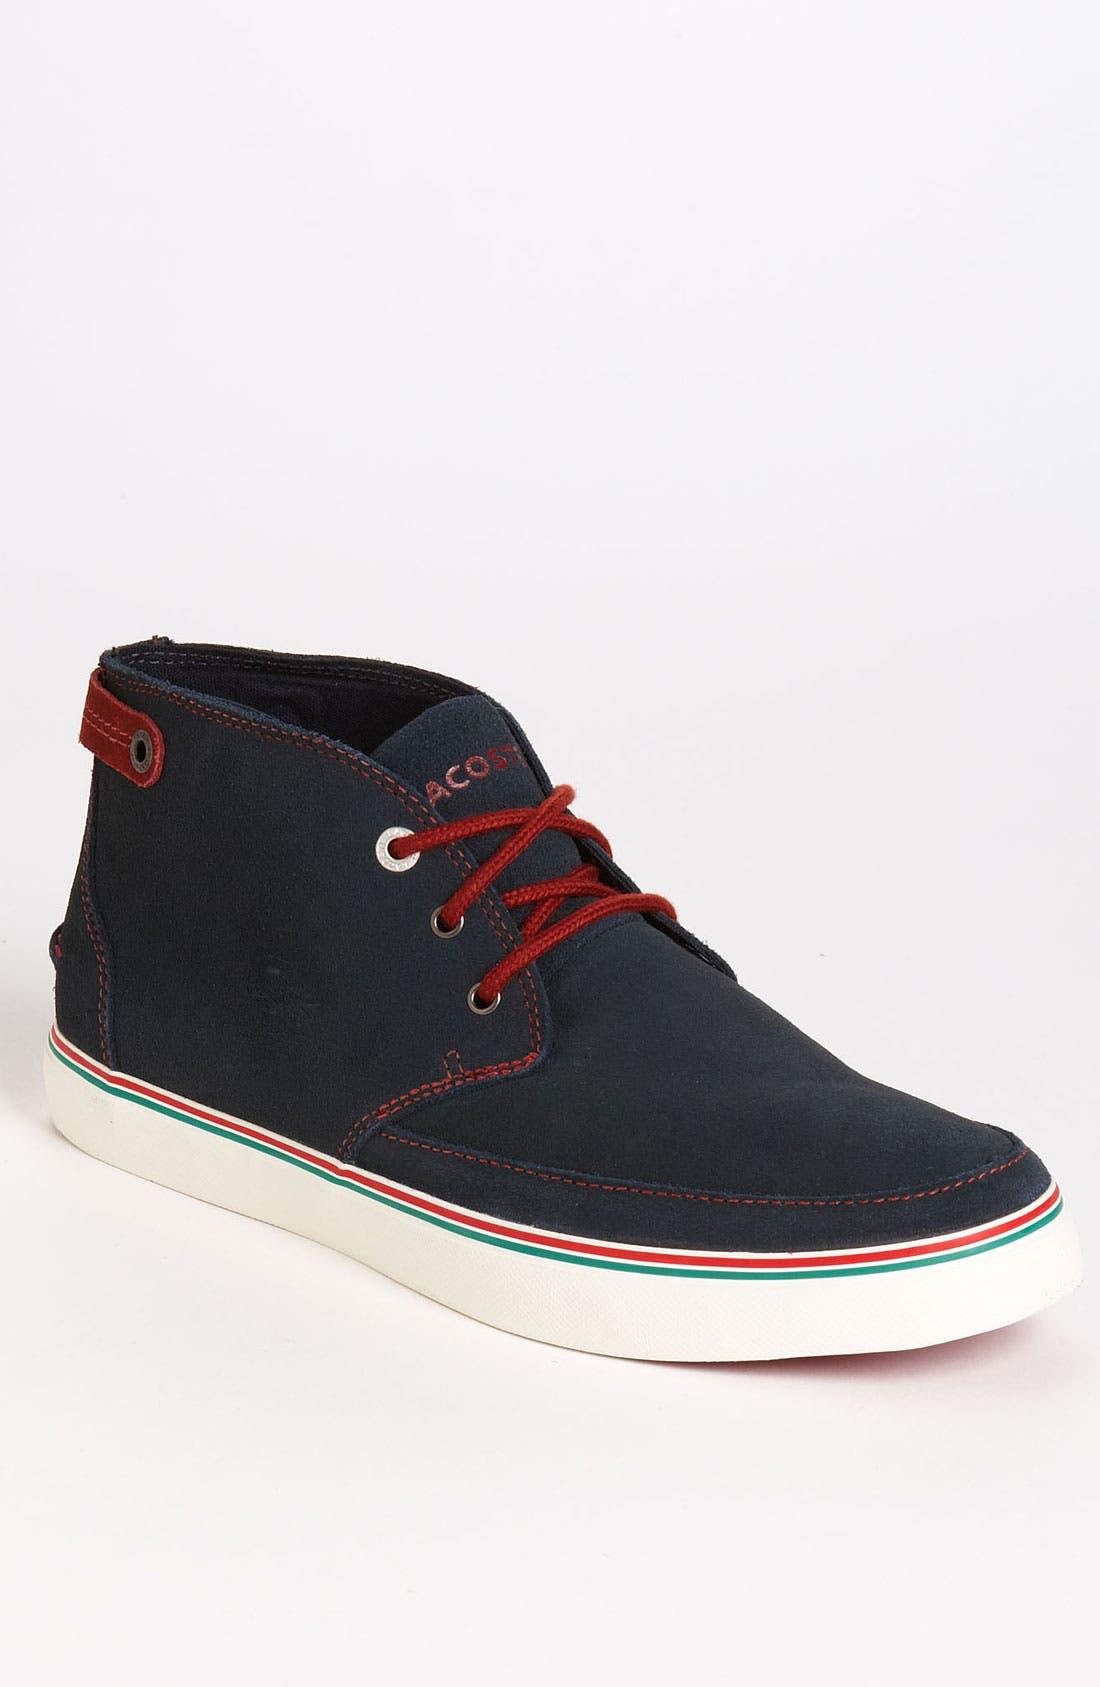 Alternate Image 1 Selected - Lacoste 'Clavel AP' Sneaker